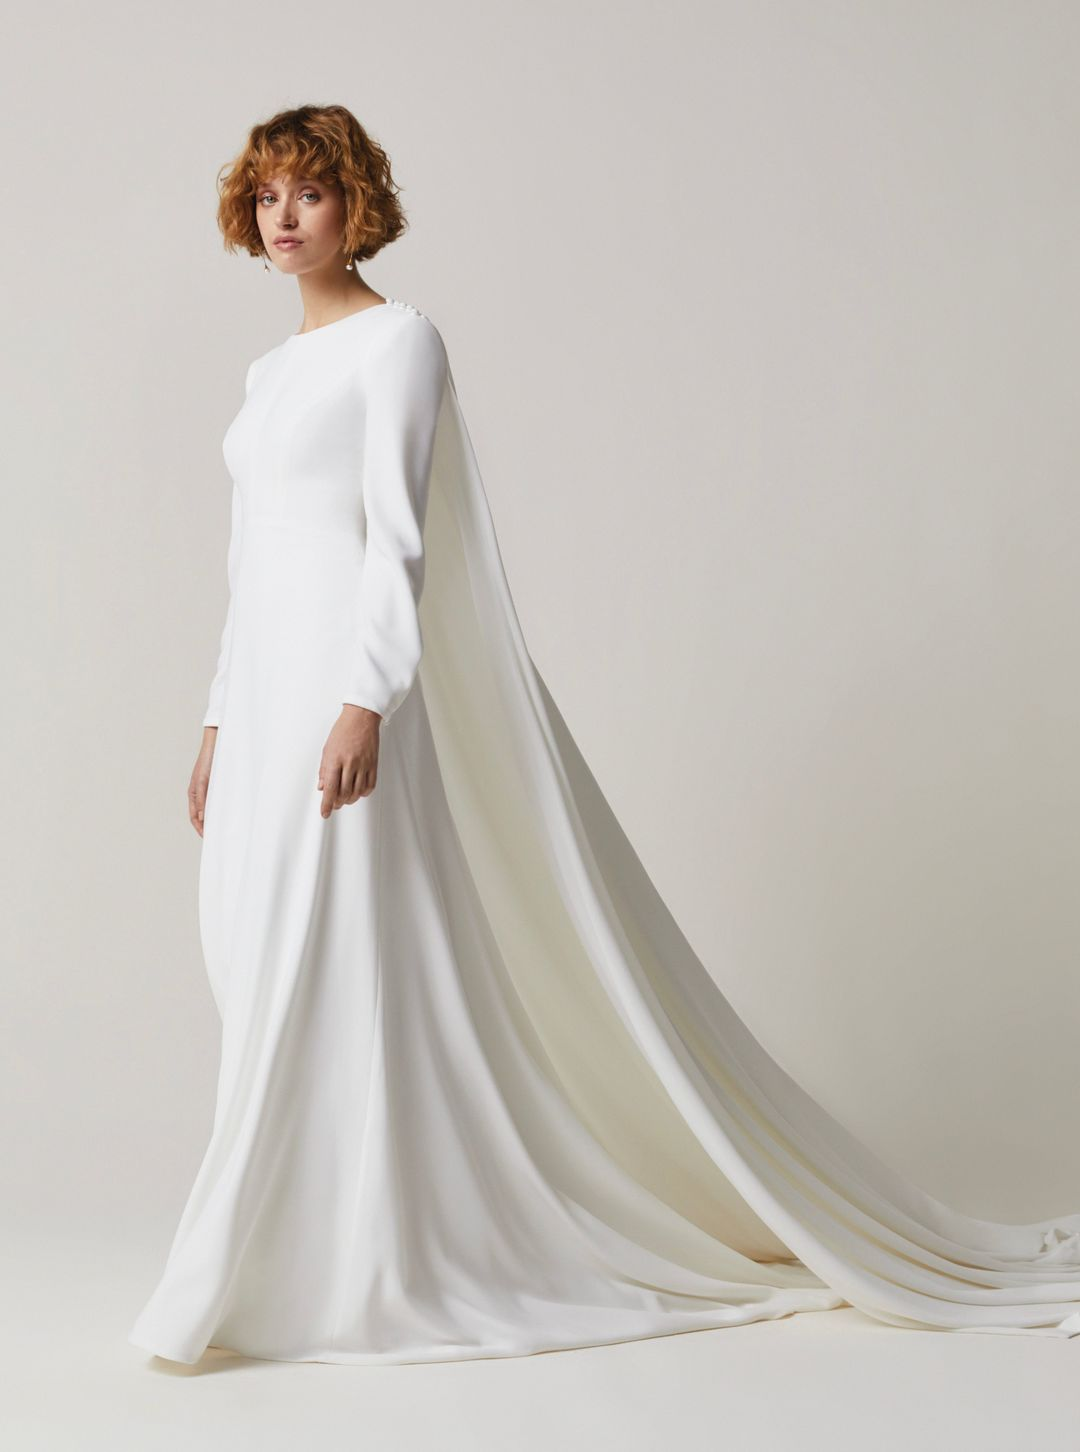 209 dress photo